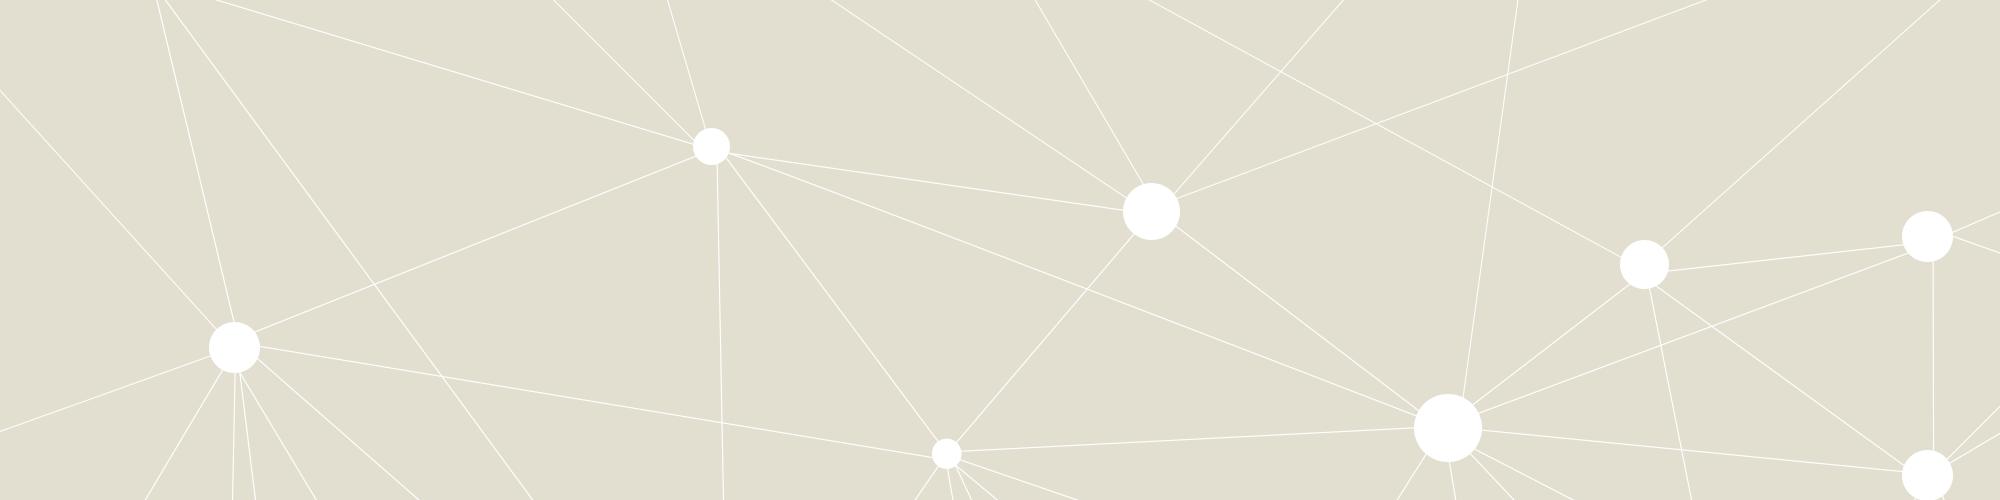 sci-bg-2-dots